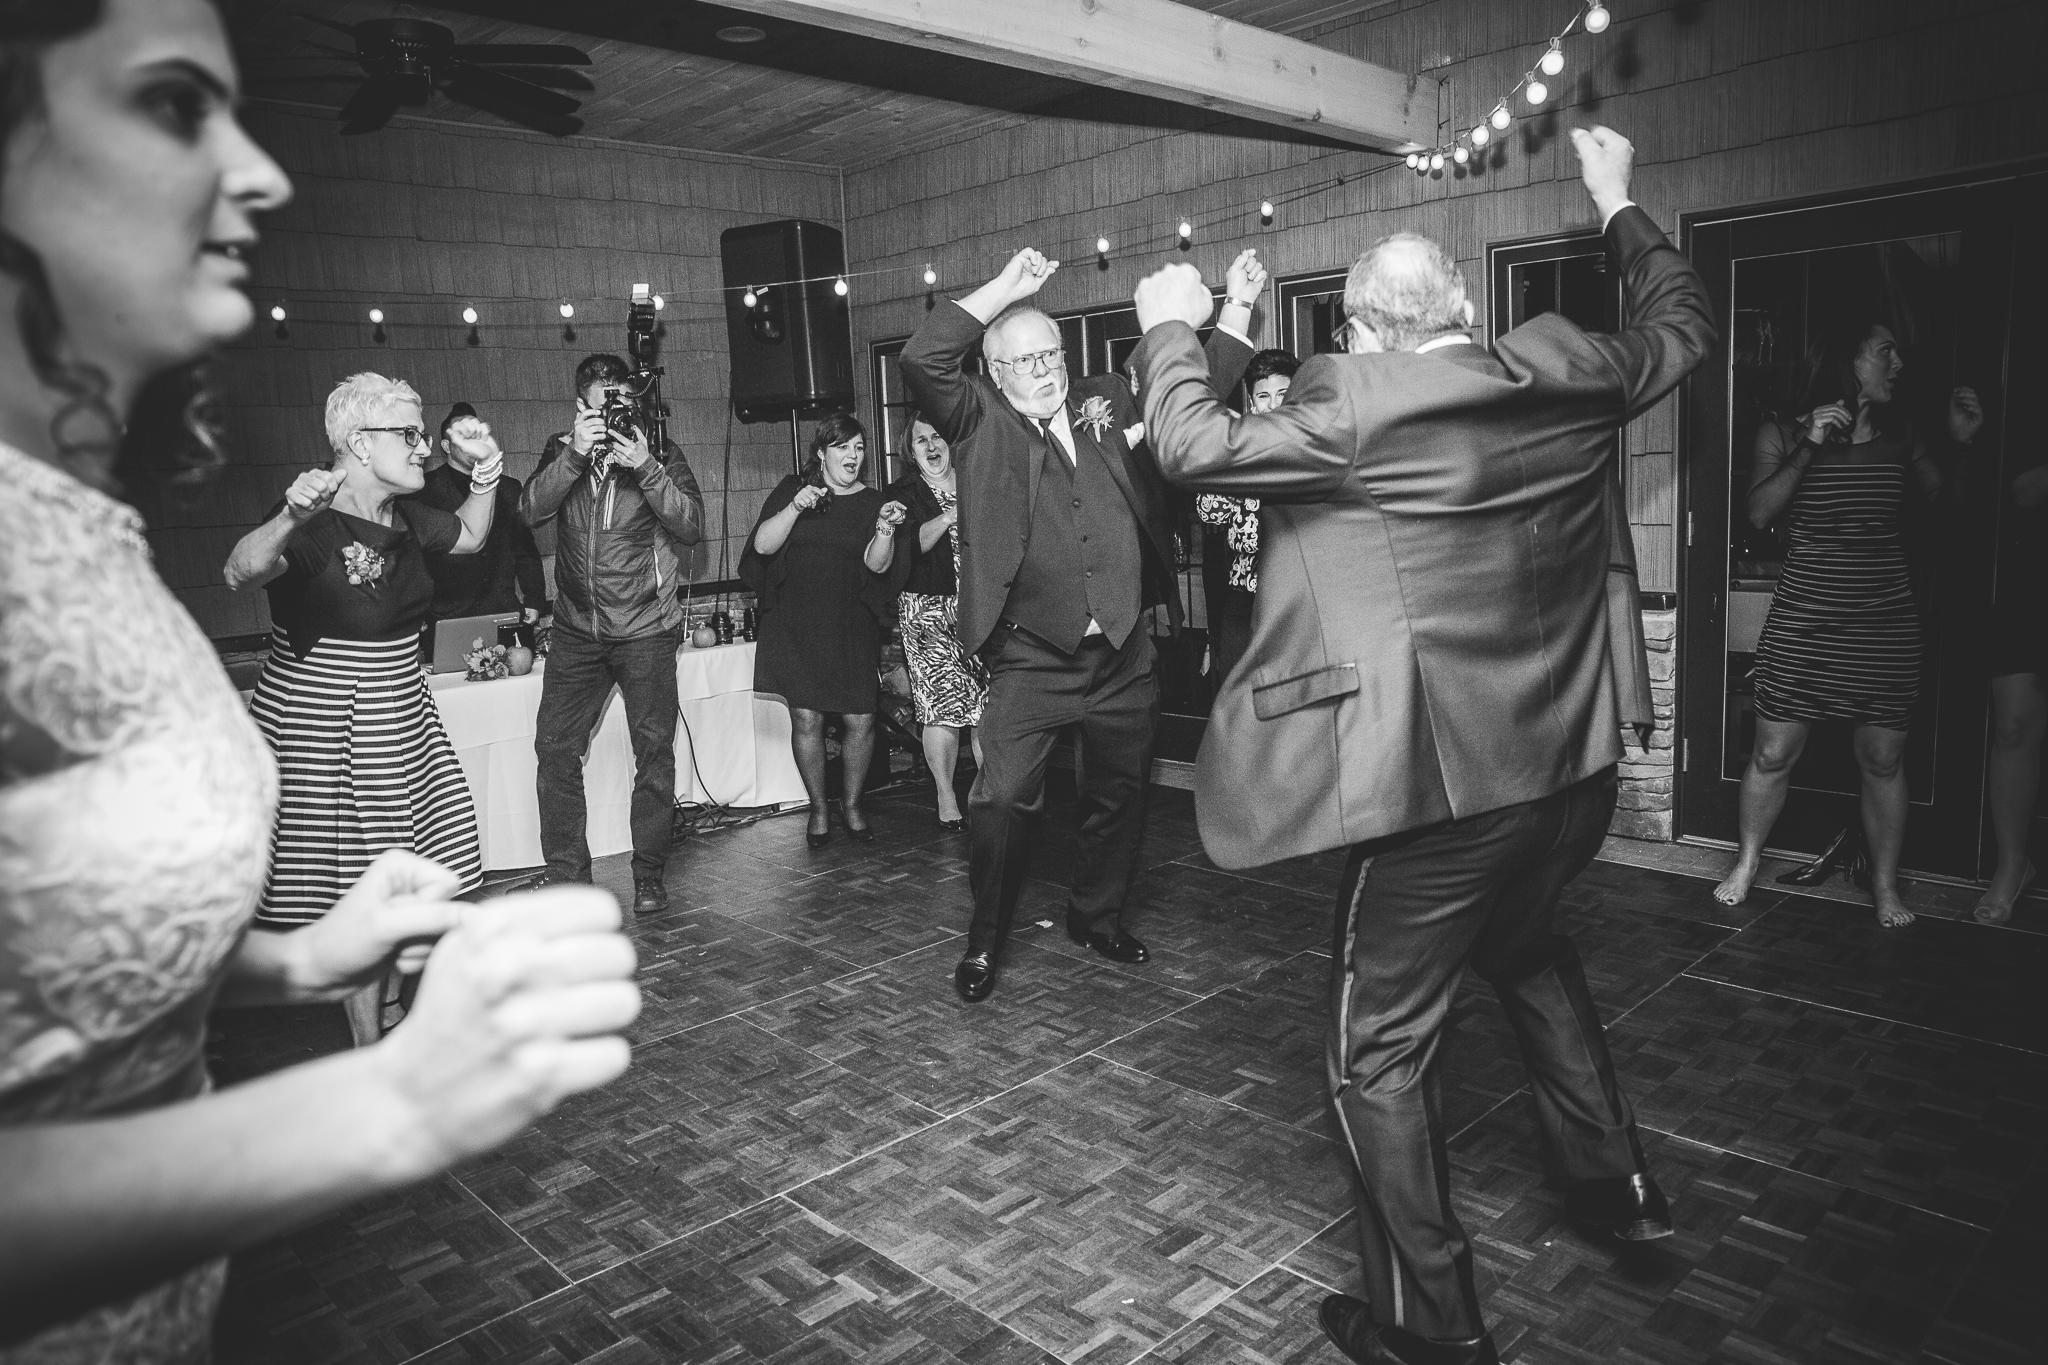 camuglia-whomstudio-chelsea_and_andy-nycphotographer-wedding-brooklyn-buffalo-timberlodge-144-0912.jpg